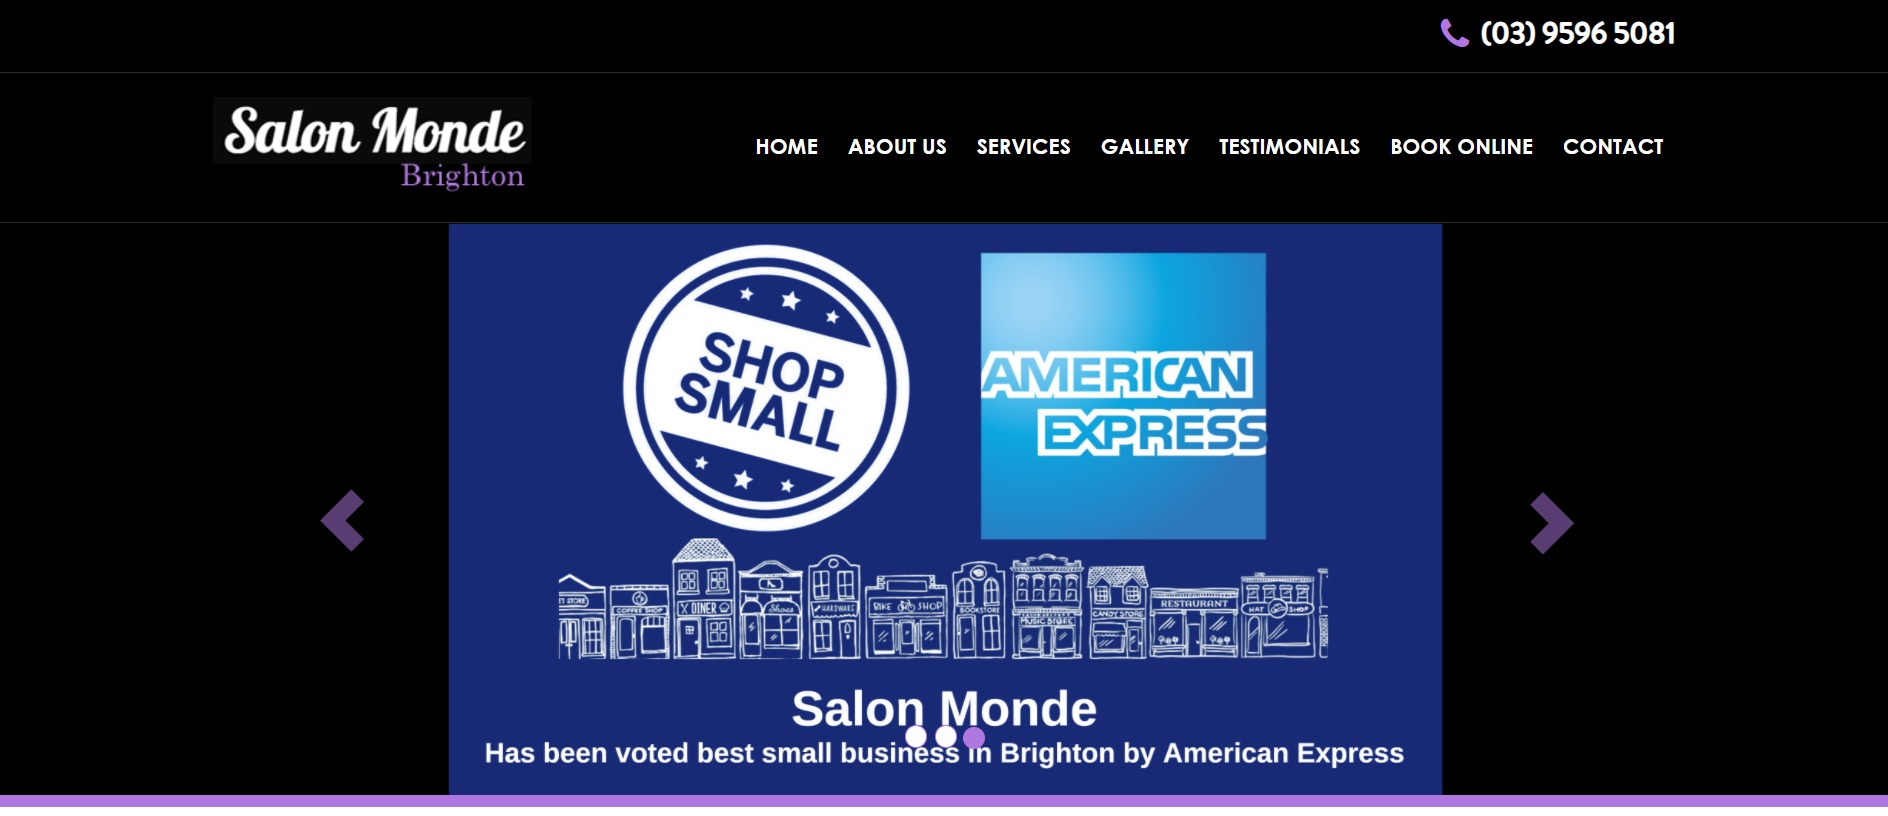 Salon Monde